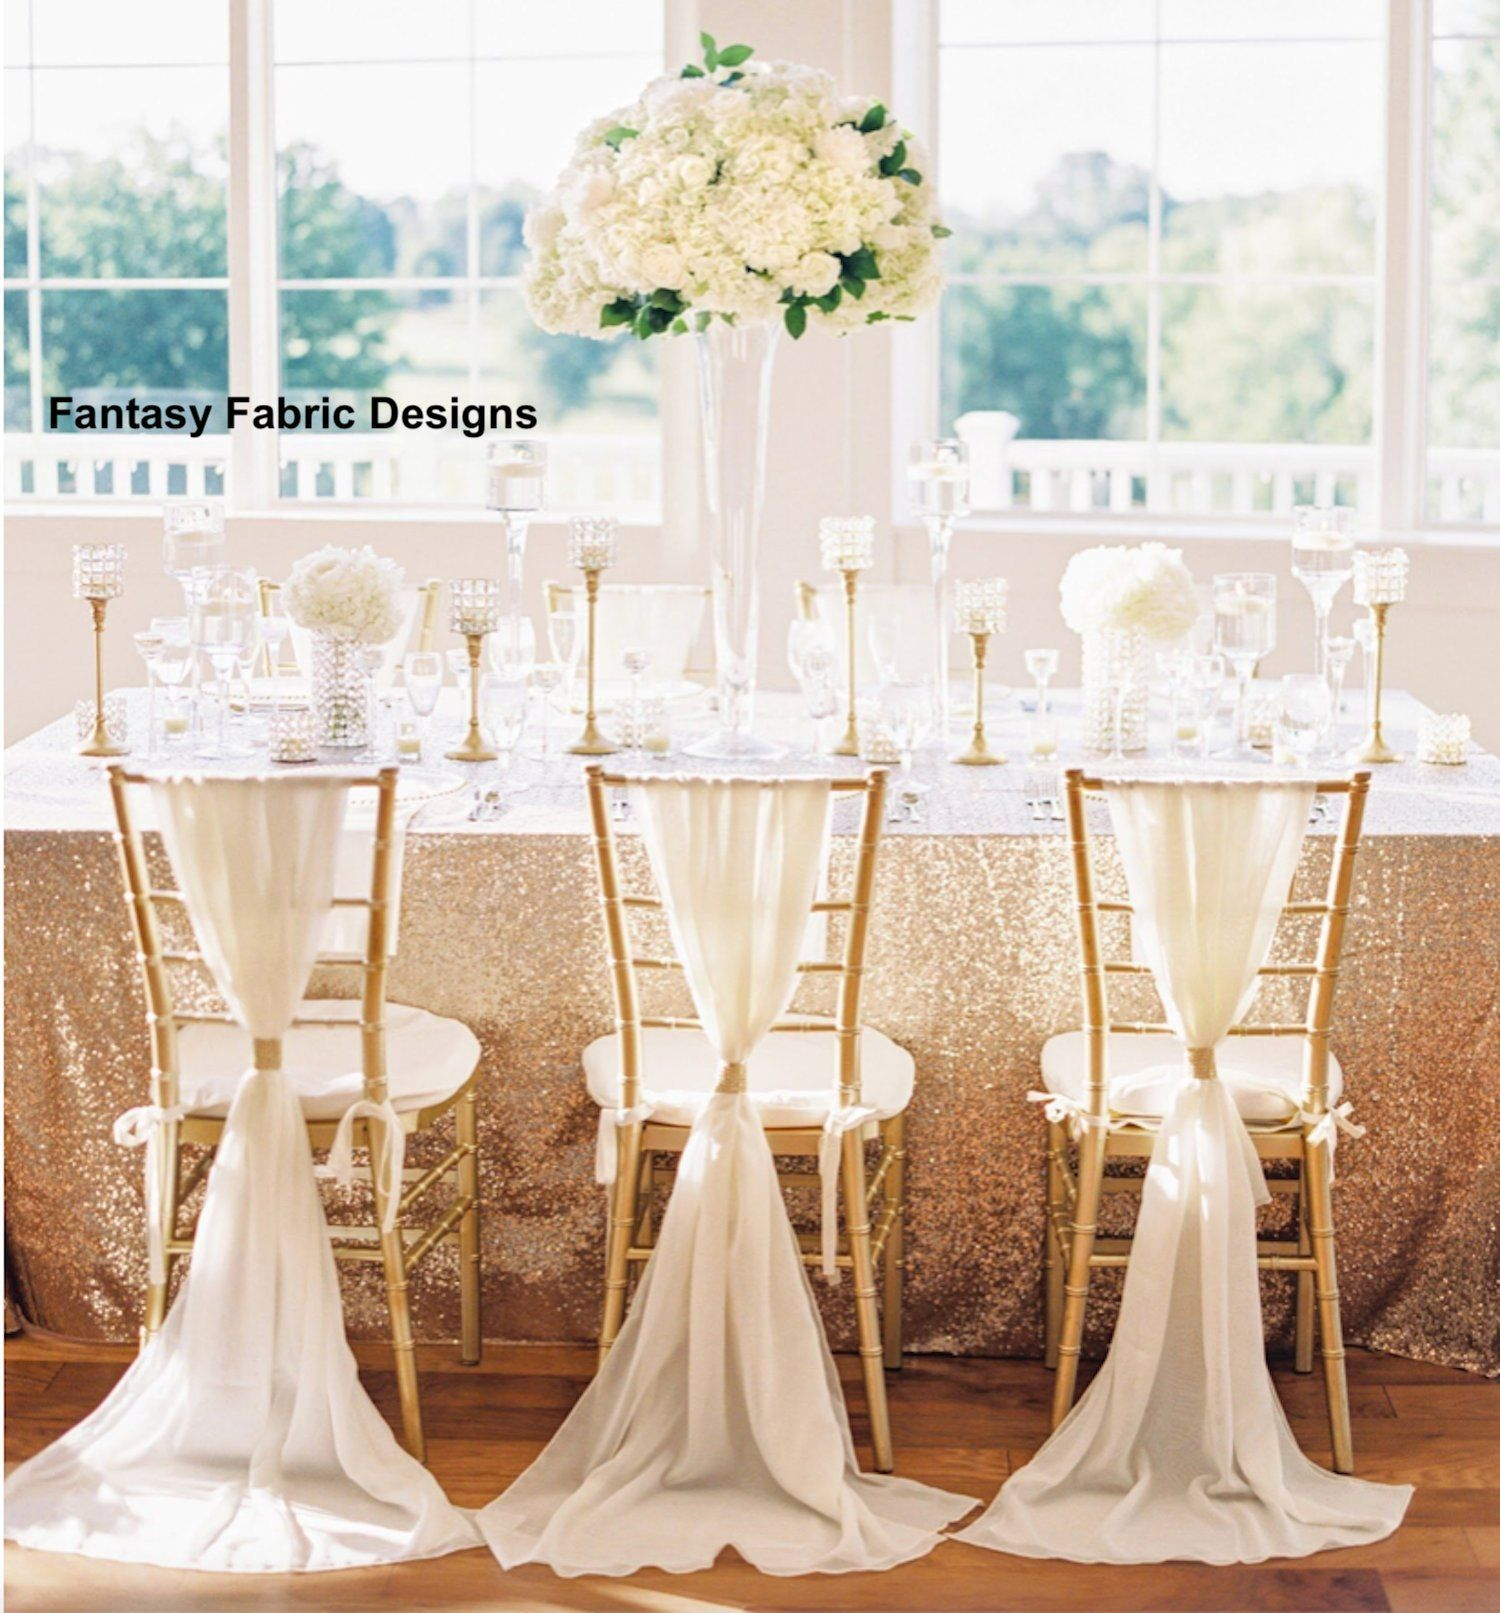 Sale 50 Chiffon Sash Chiavari Chair Cover Sash With Rhinestone Ring Wrap Chair Cover Wedding Recep Wedding Chair Sashes Wedding Chairs Chair Covers Wedding